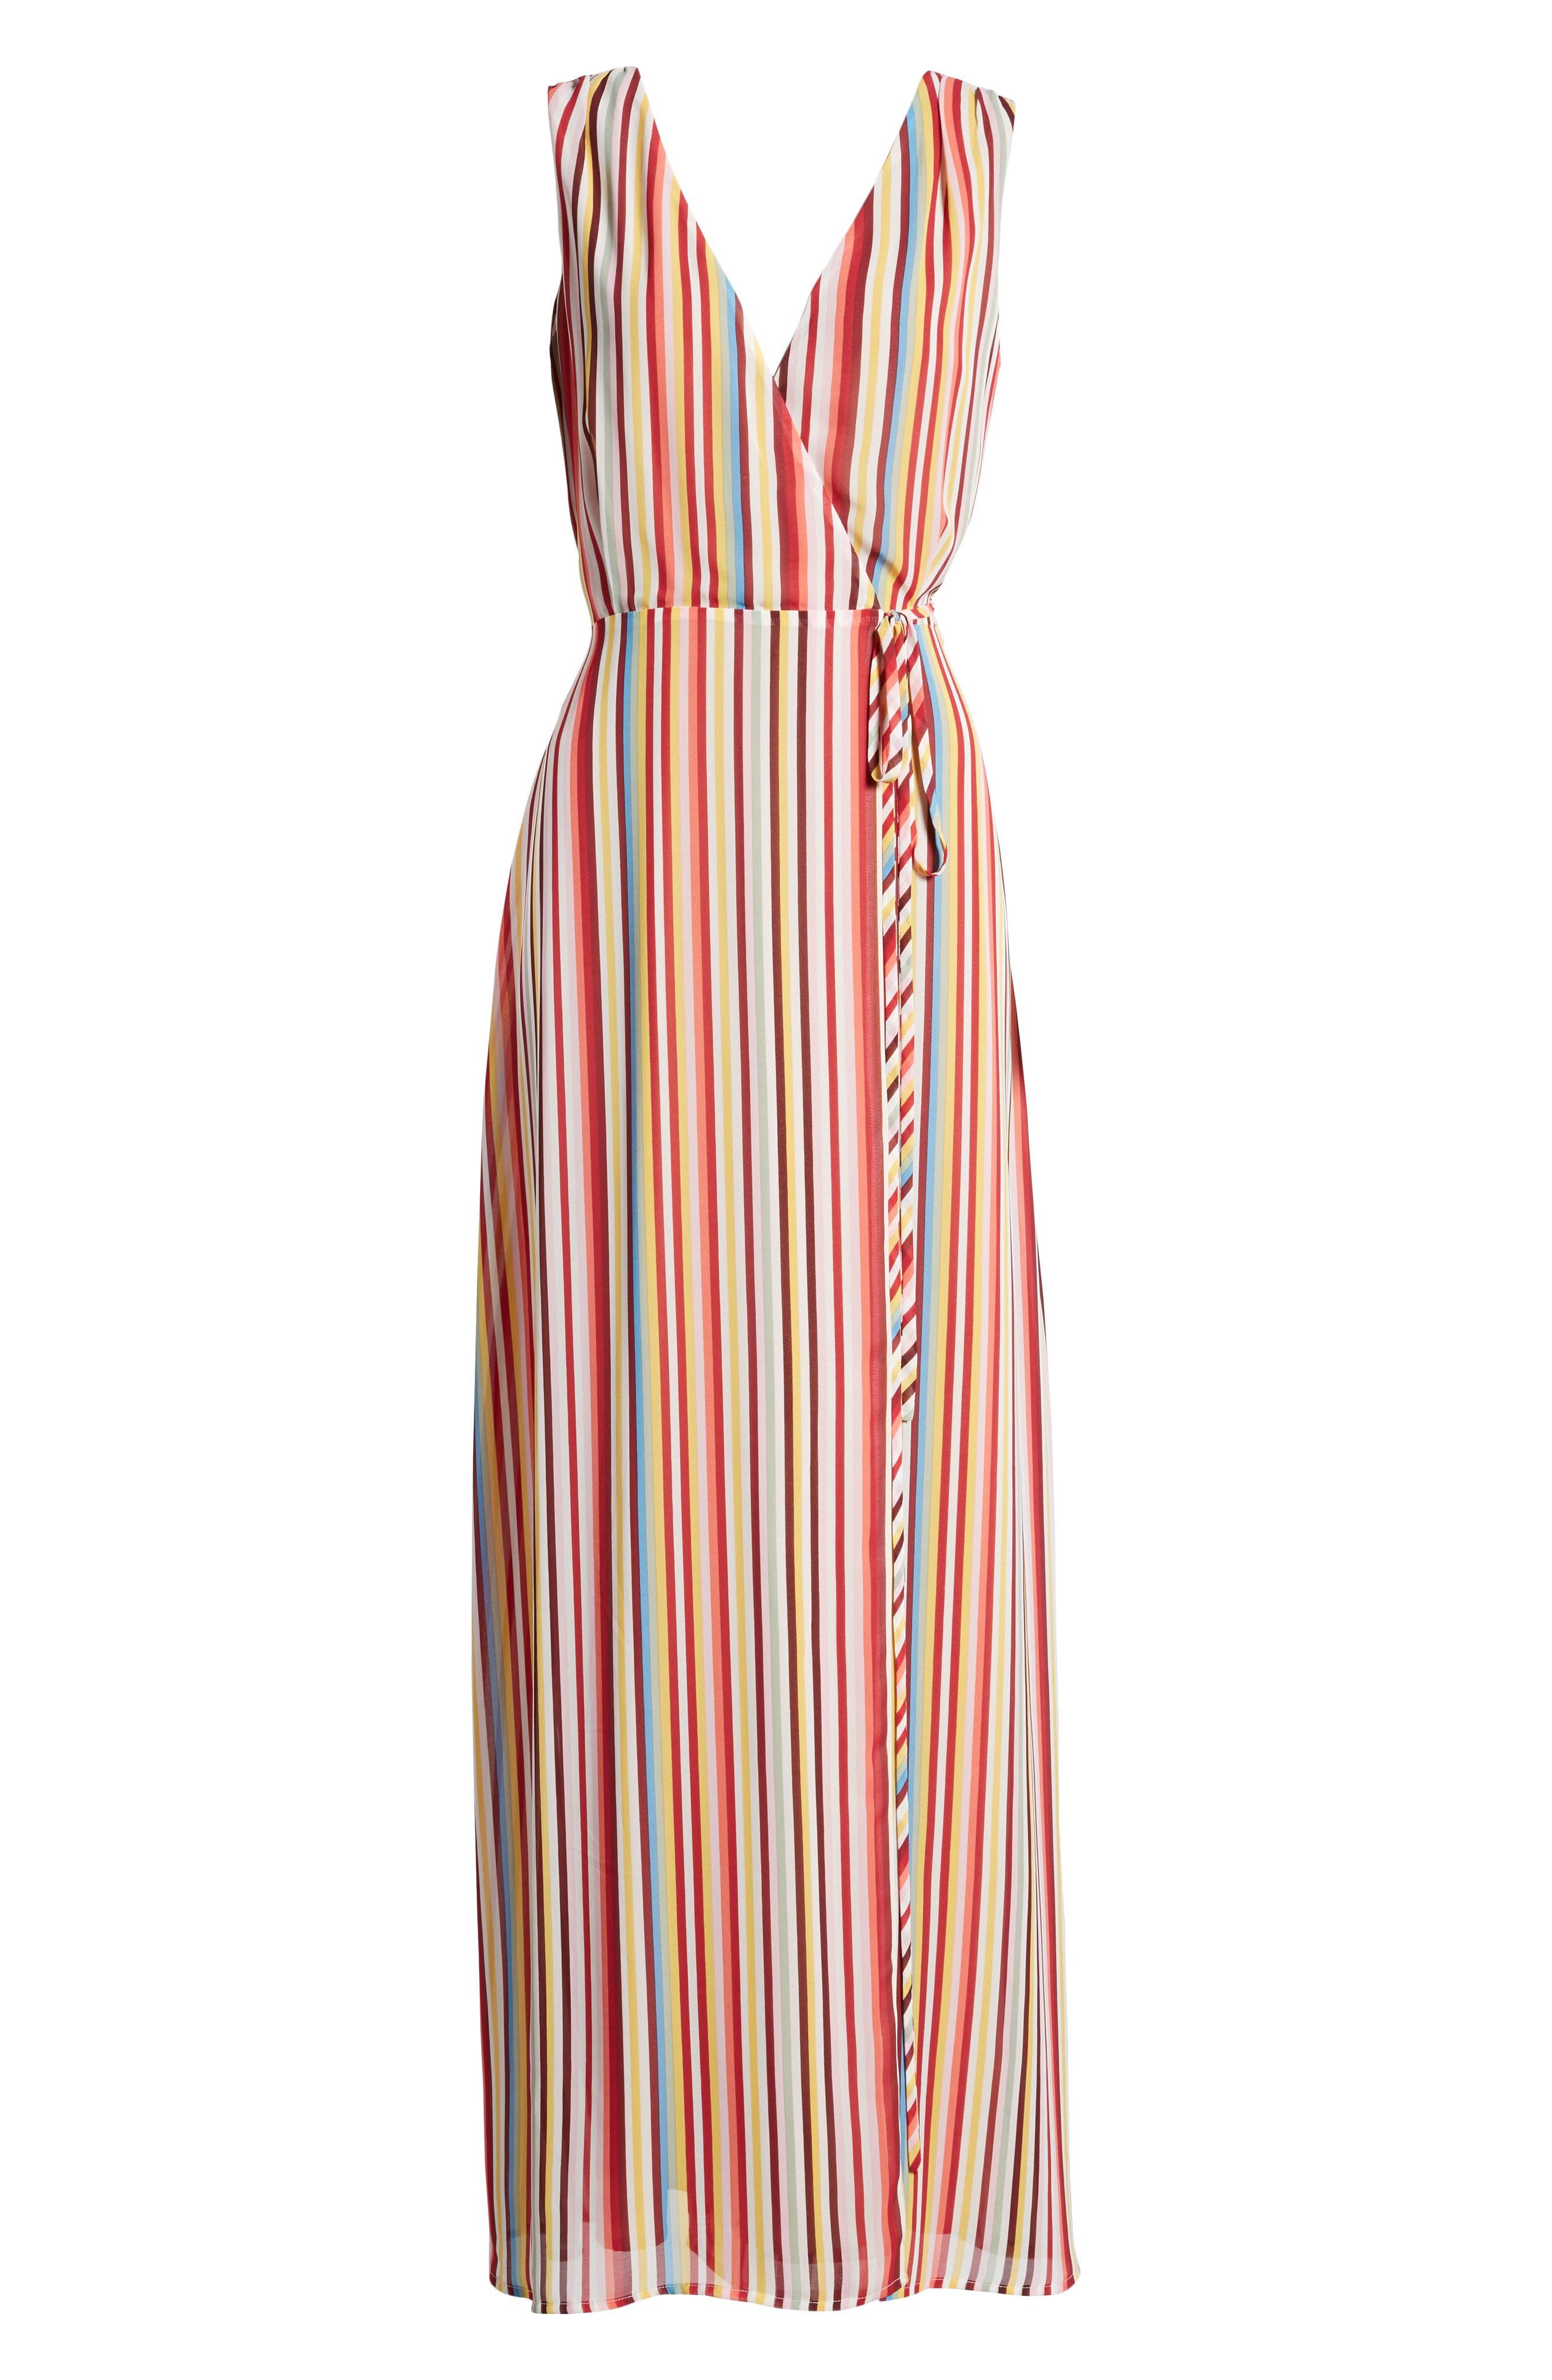 Bobby Wrap Maxi Dress,                             Alternate thumbnail 7, color,                             Red Multi Stripe